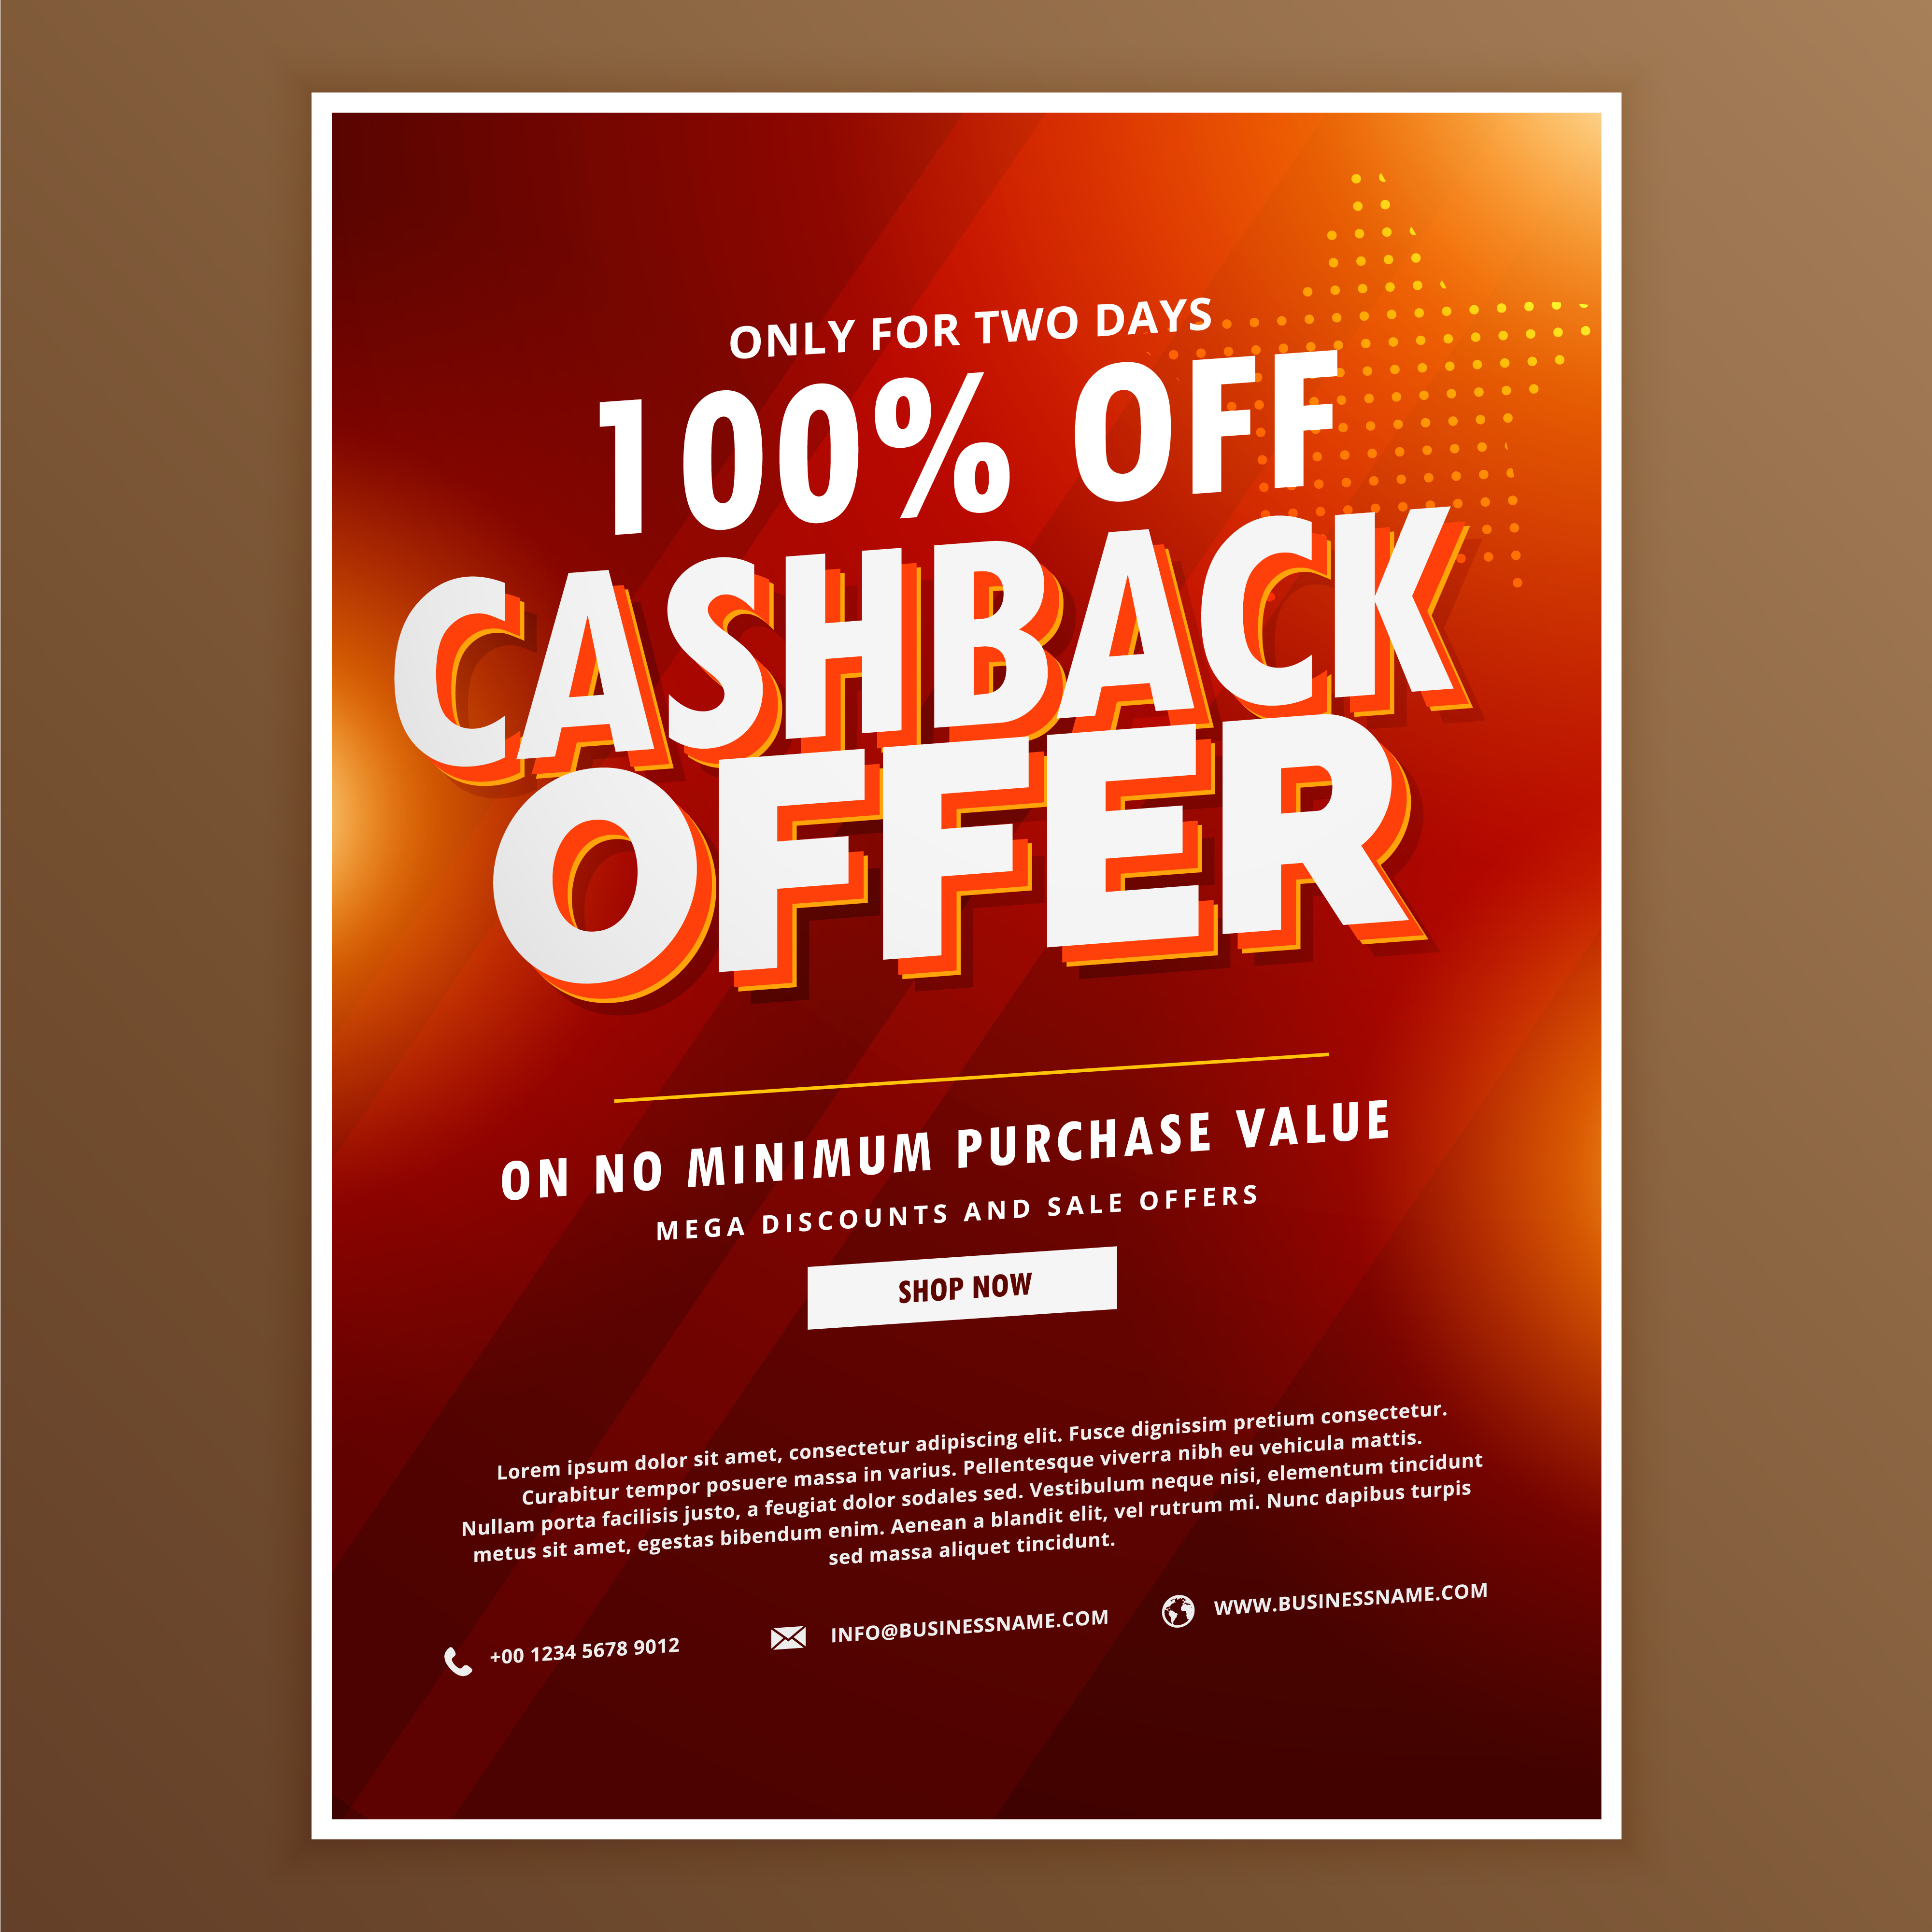 advertising promotional cashback offer design template